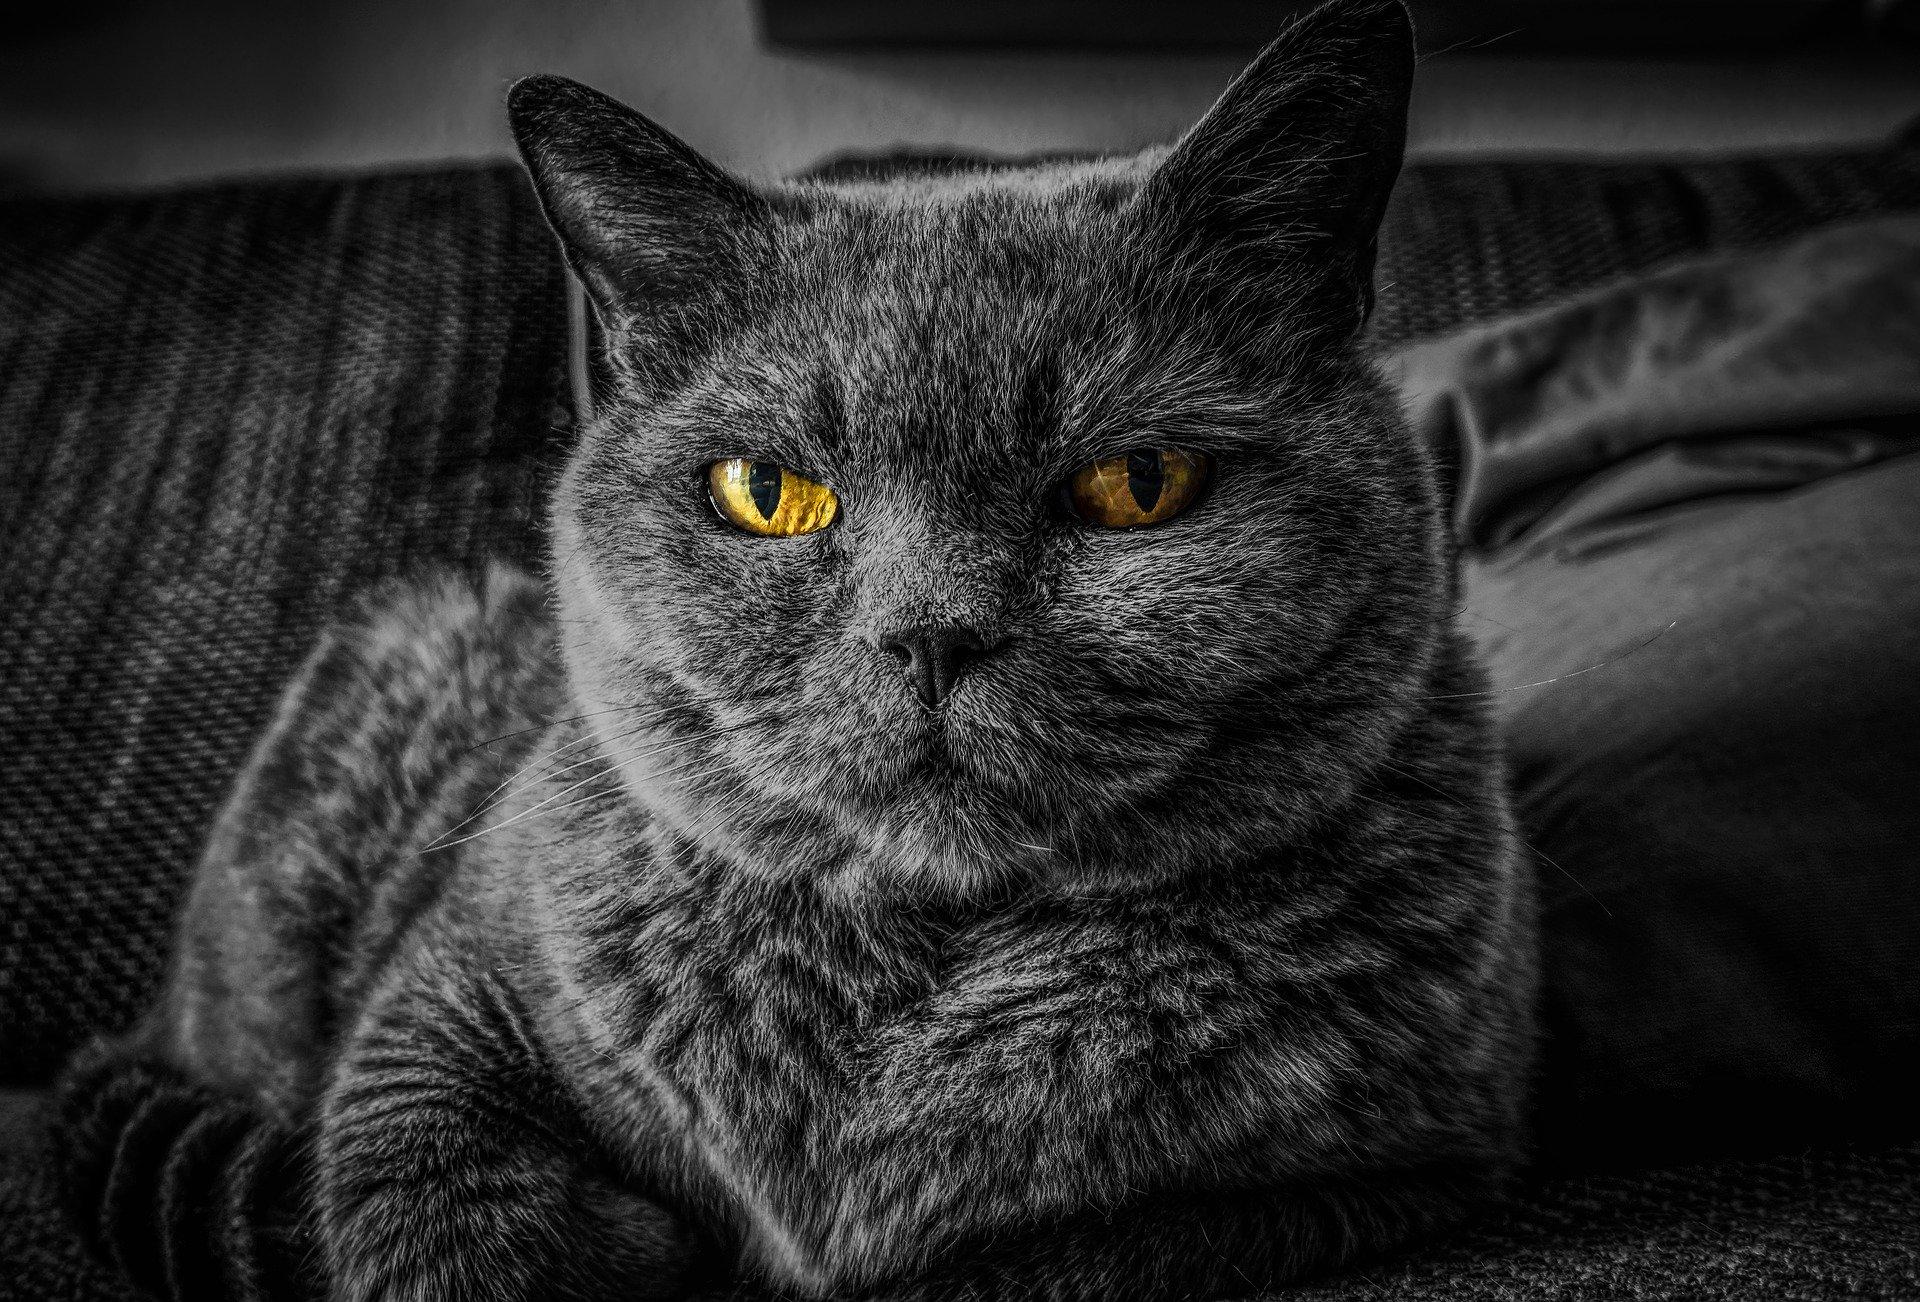 Enseña a tu gato con paciencia y respeto